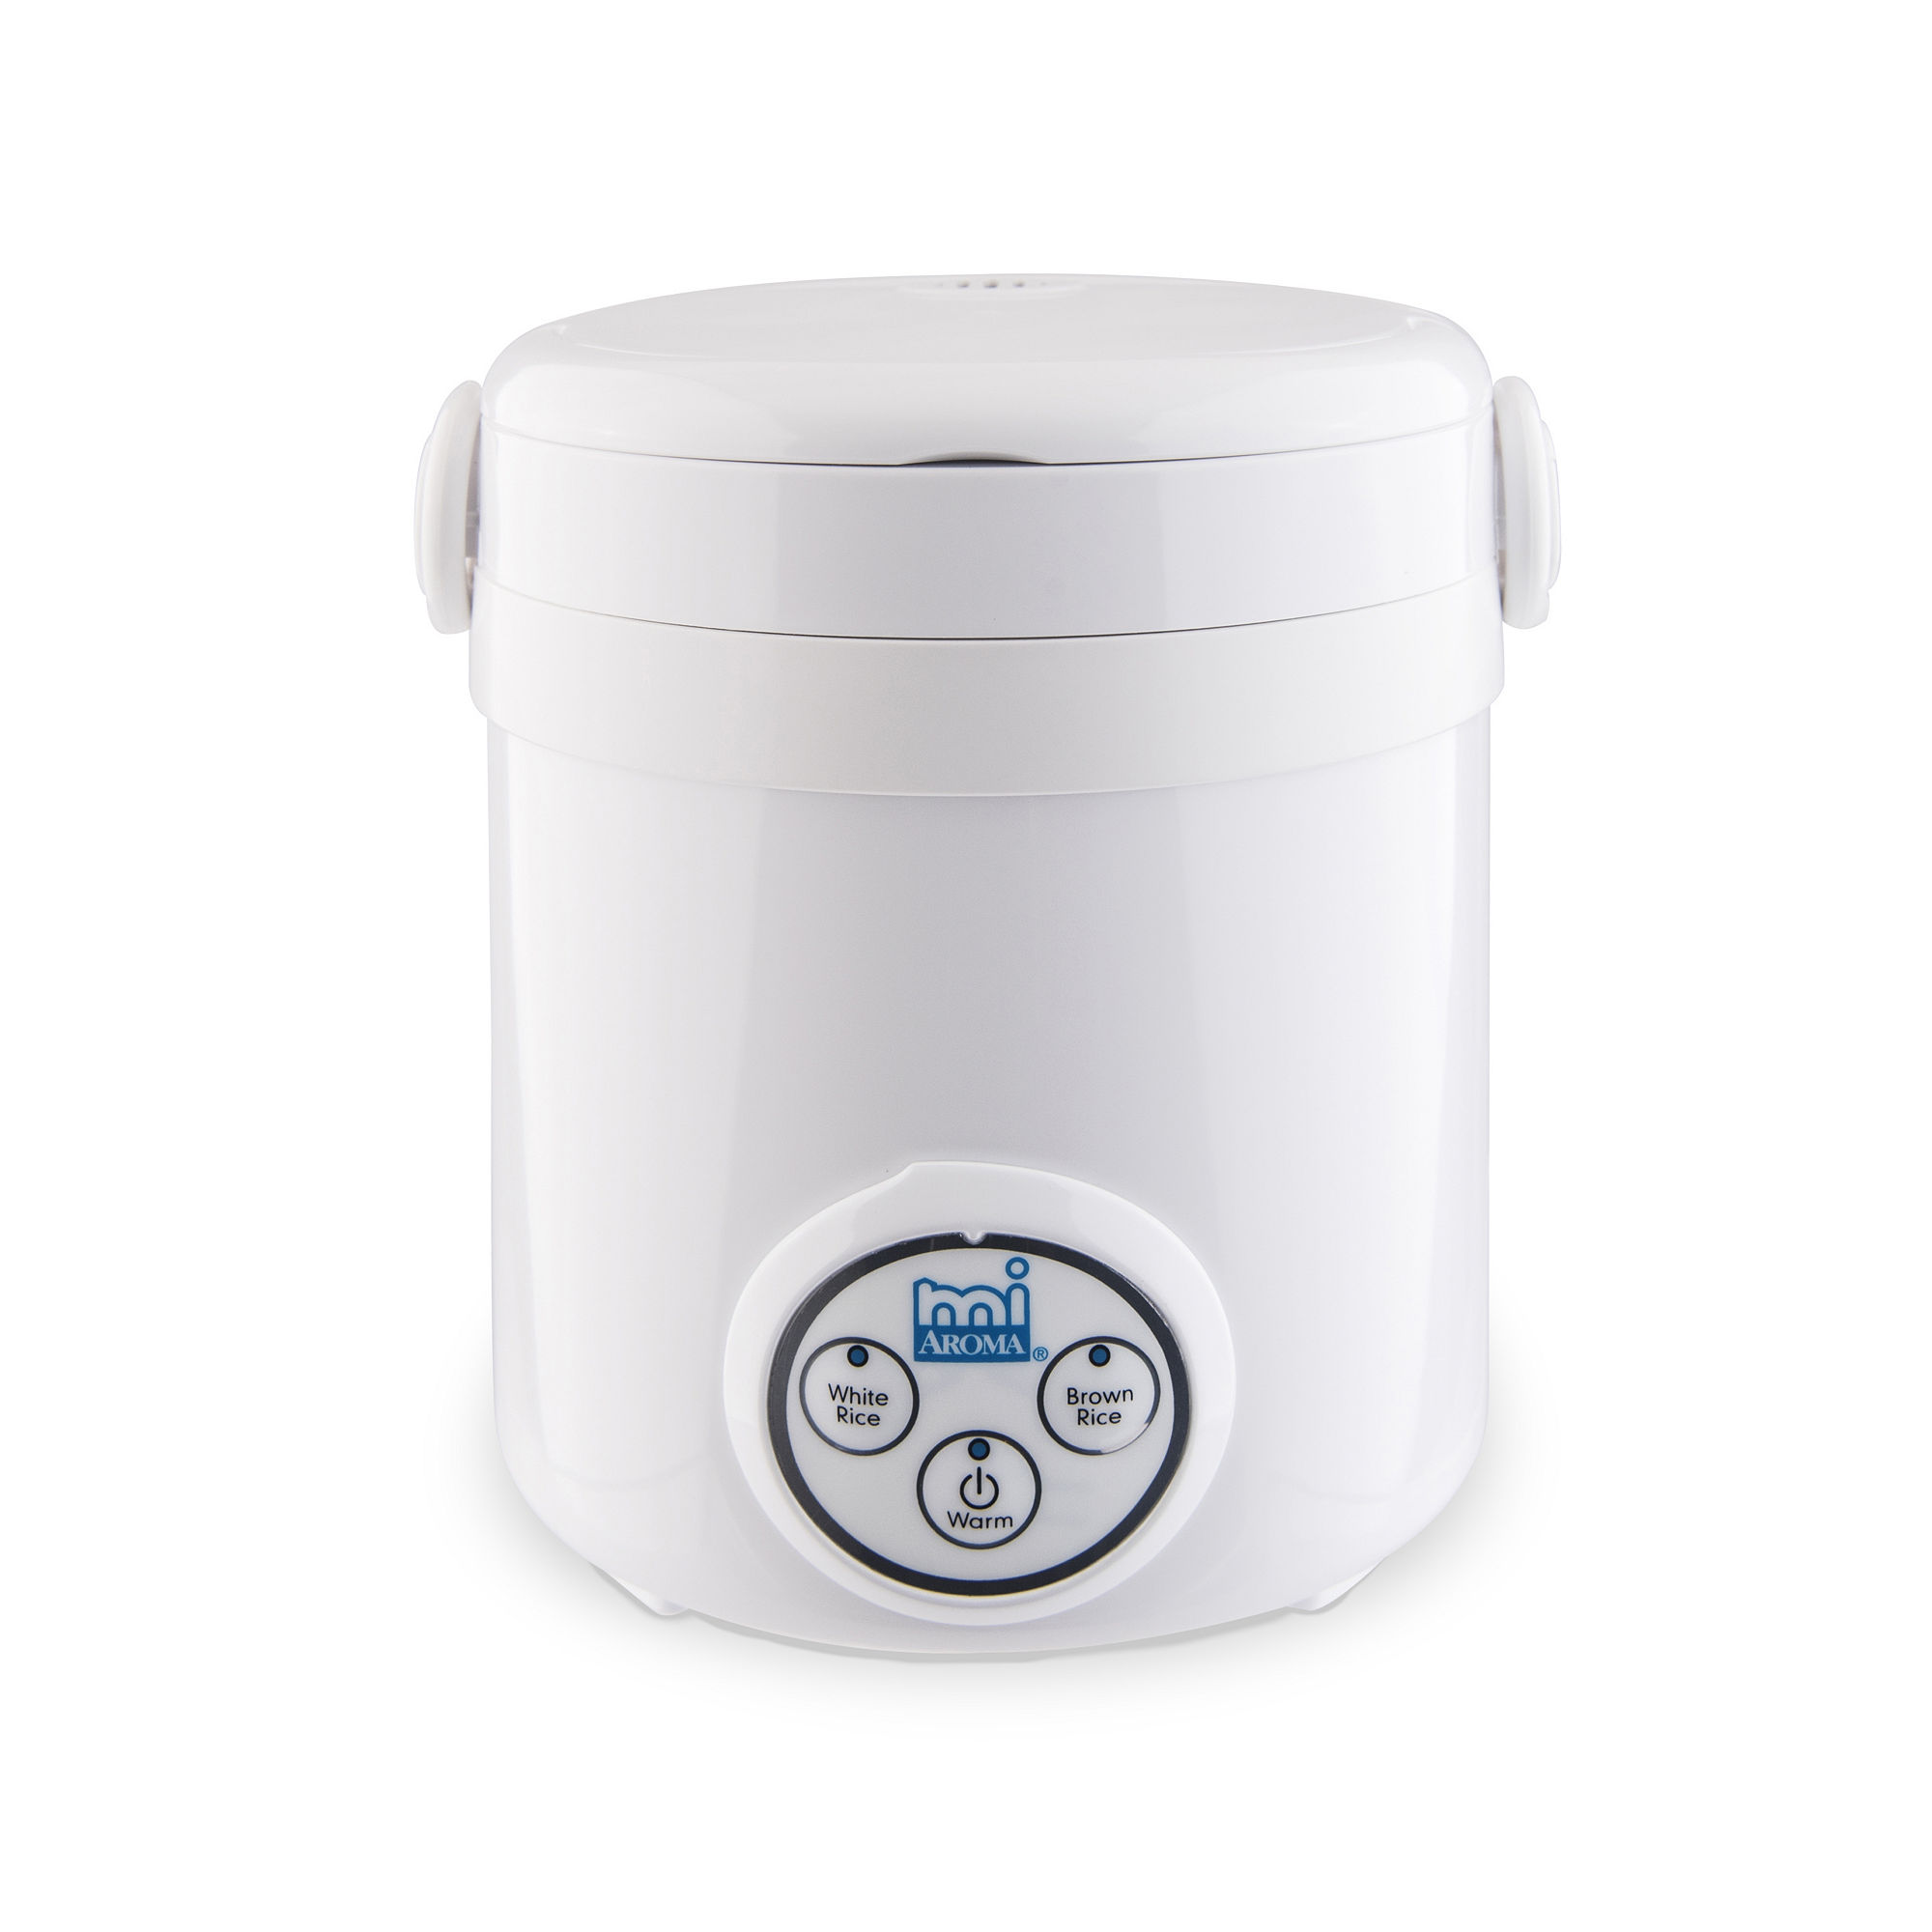 Aroma Mrc-903d Rice Cooker